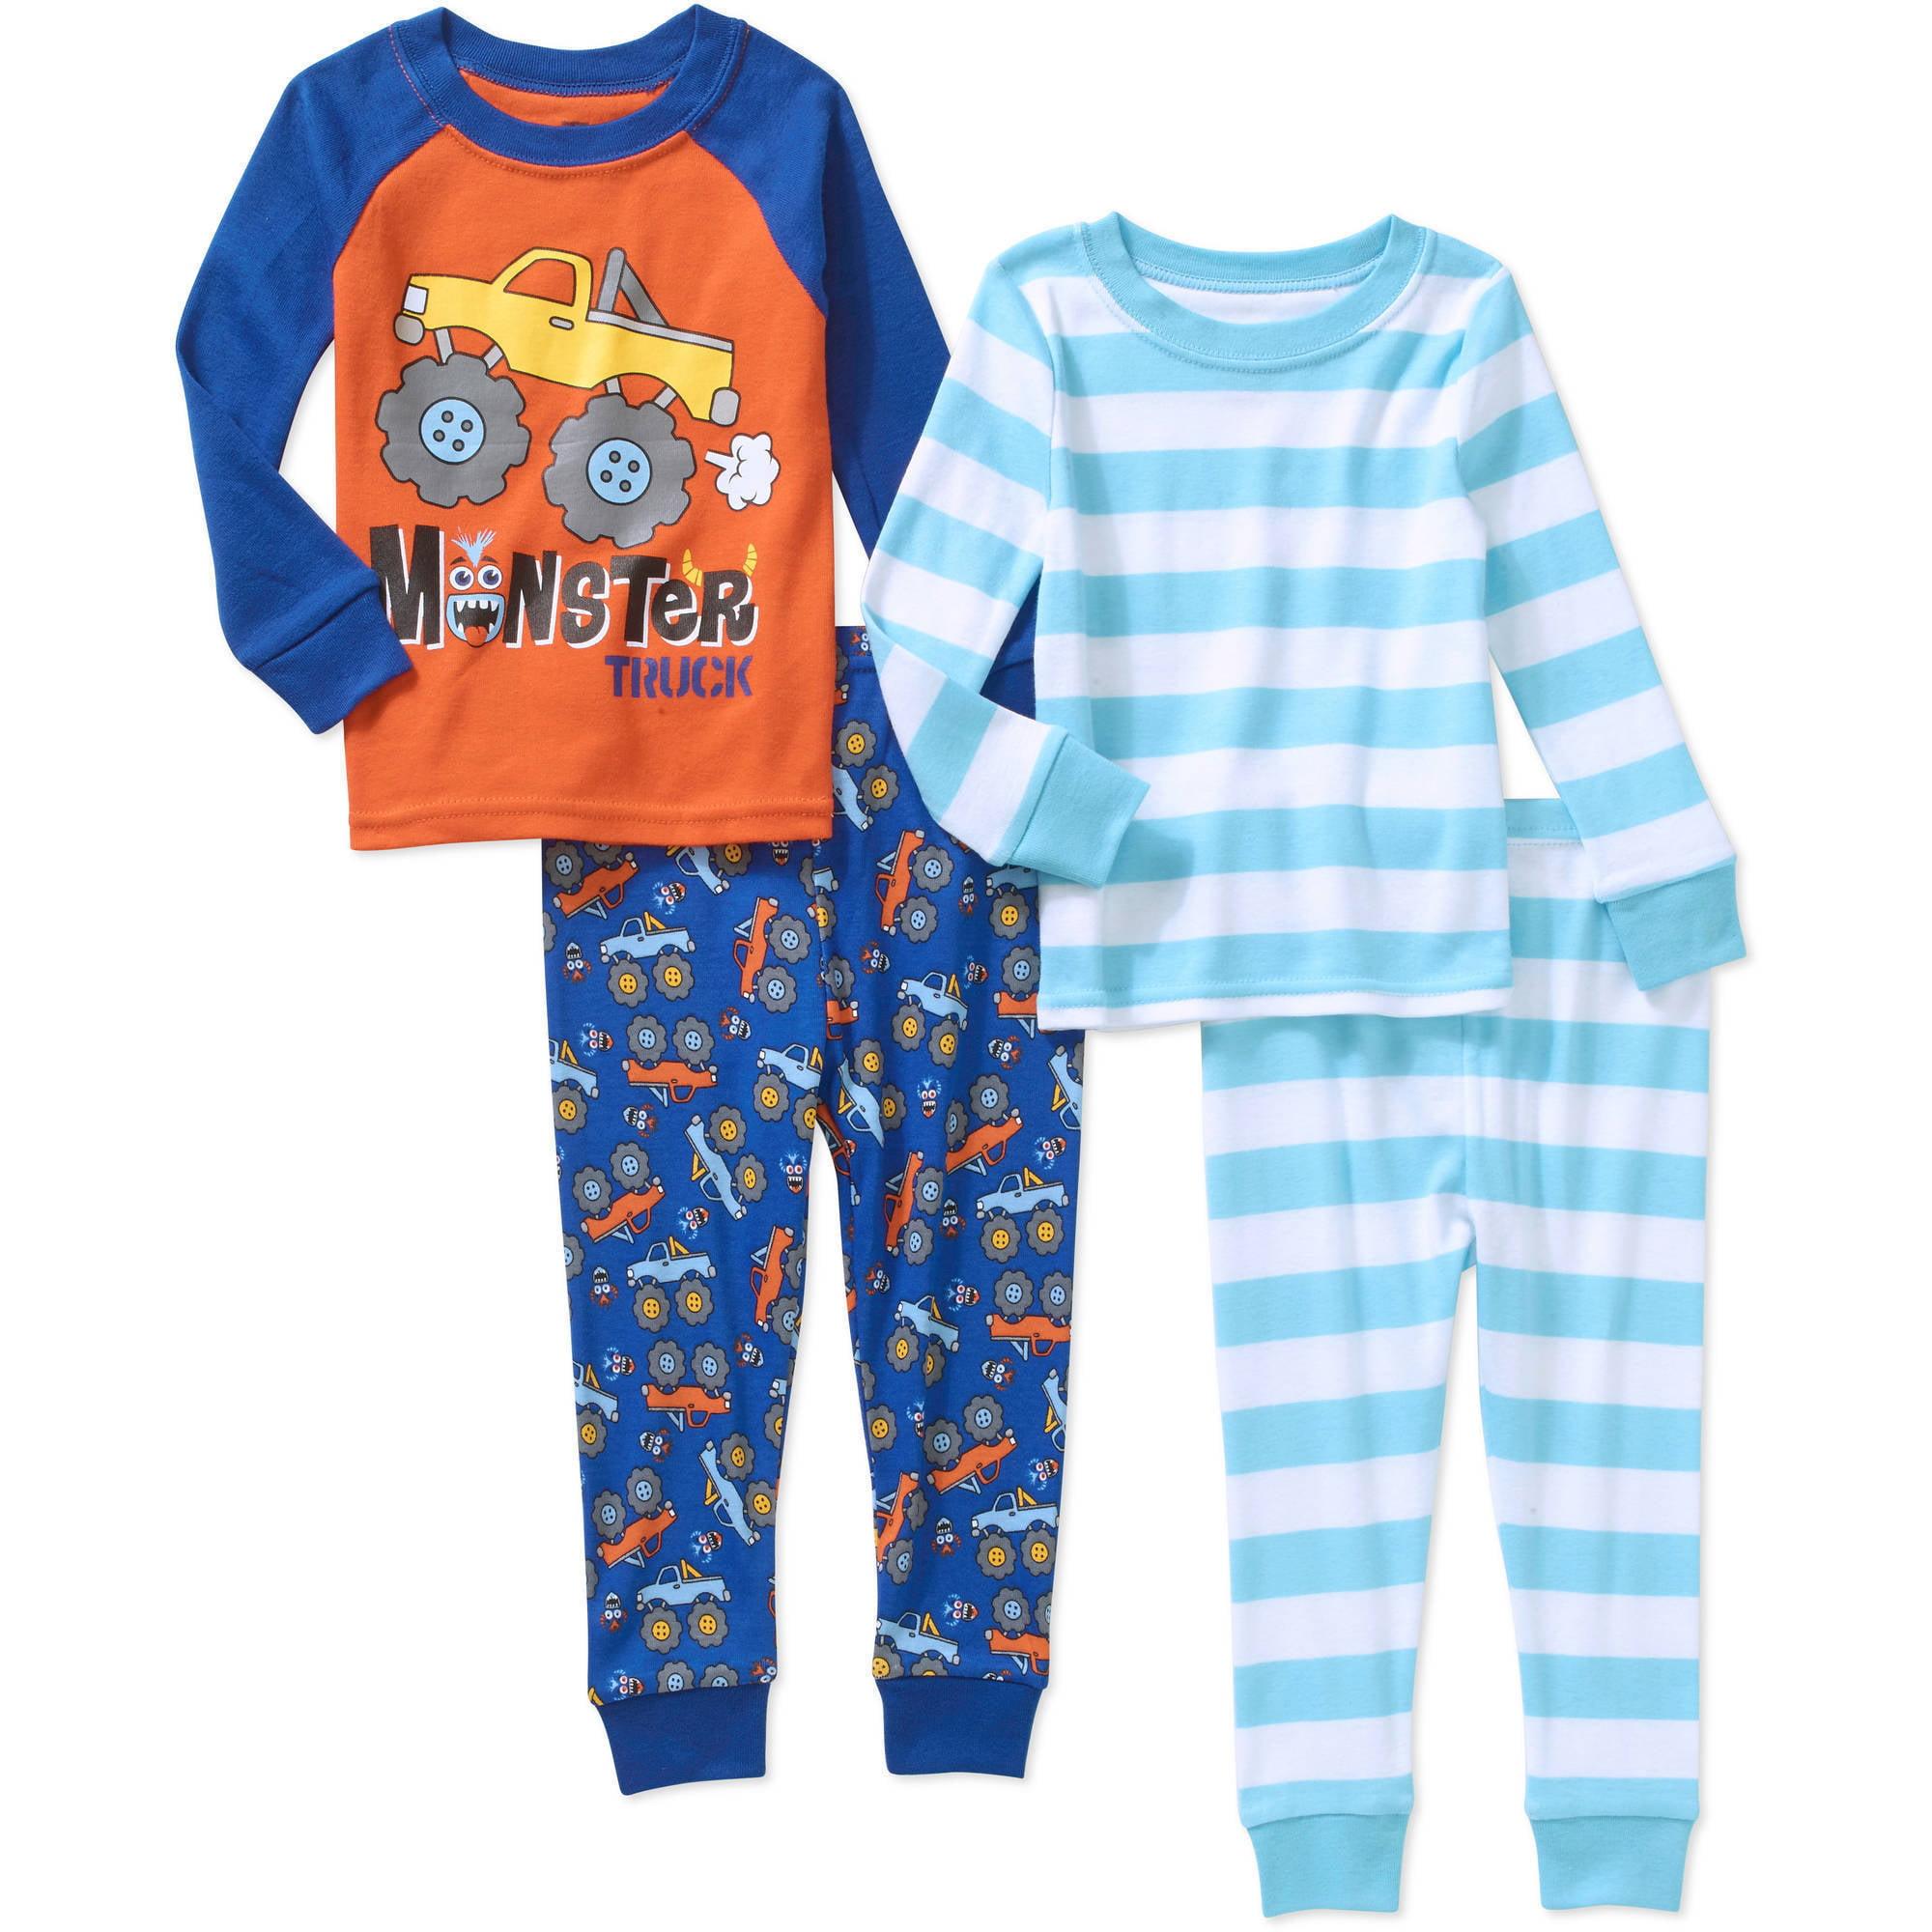 Baby Toddler Boys' Cotton Tight Fit Pajamas, 4-Piece Set